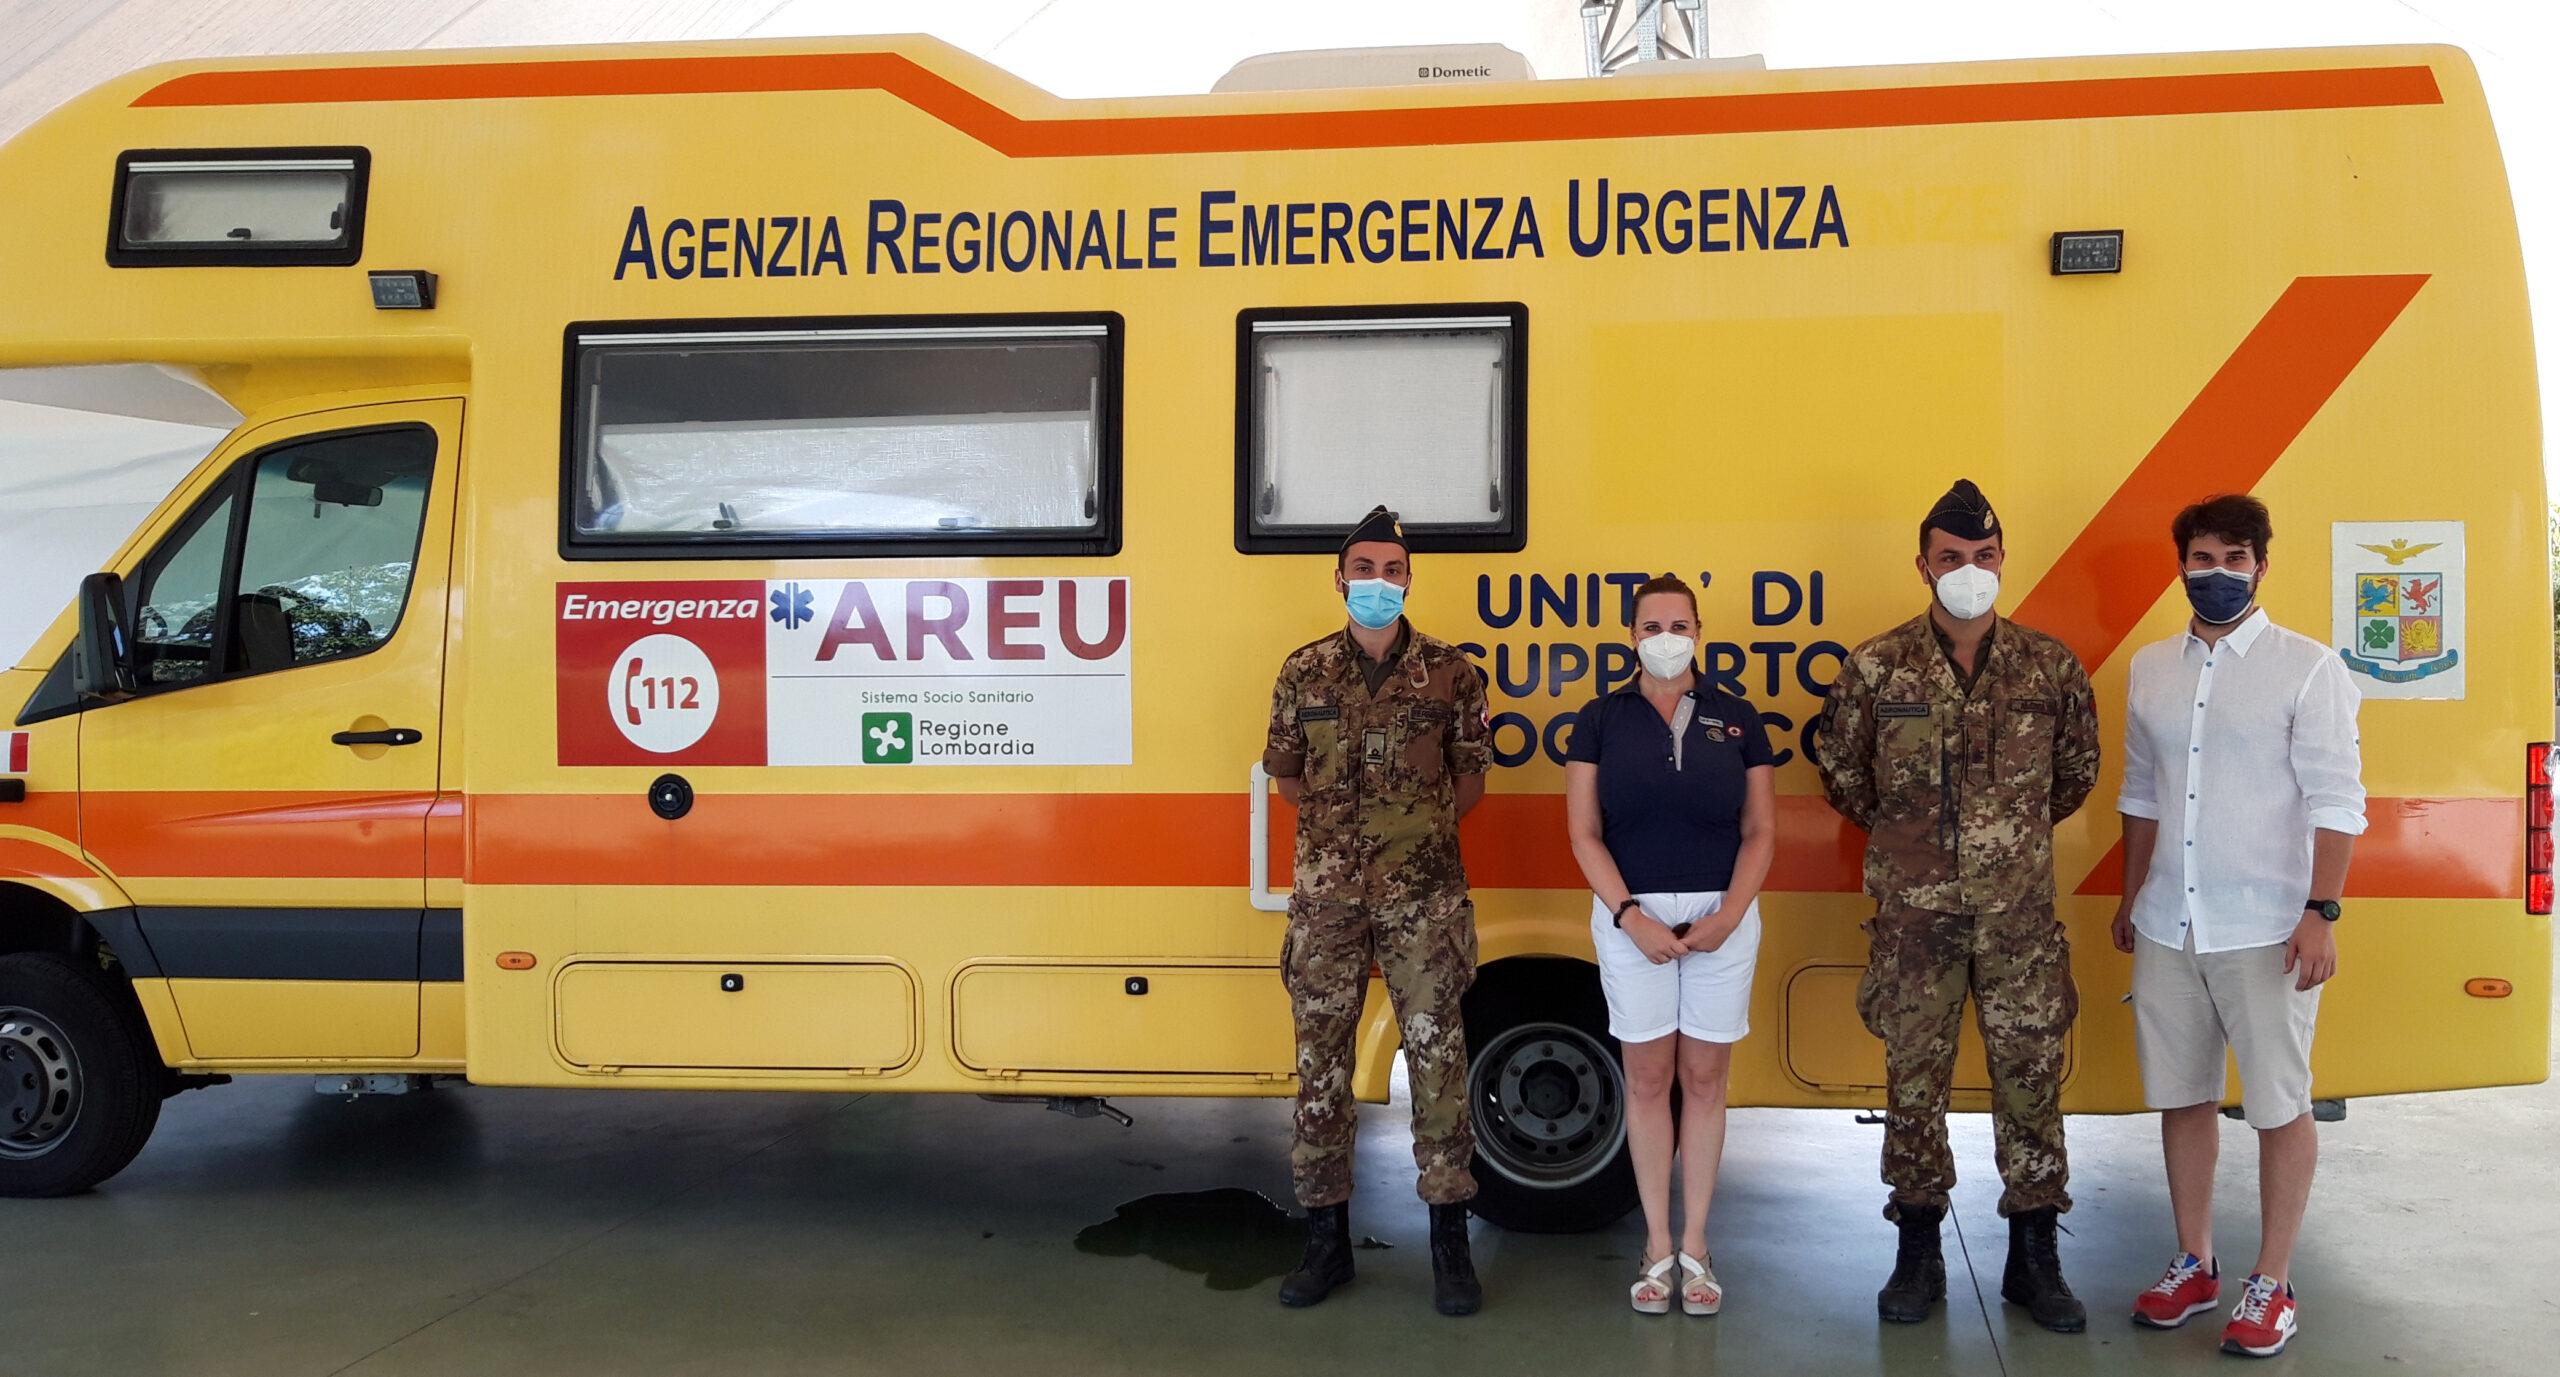 unità vaccinale mobile areu (4)